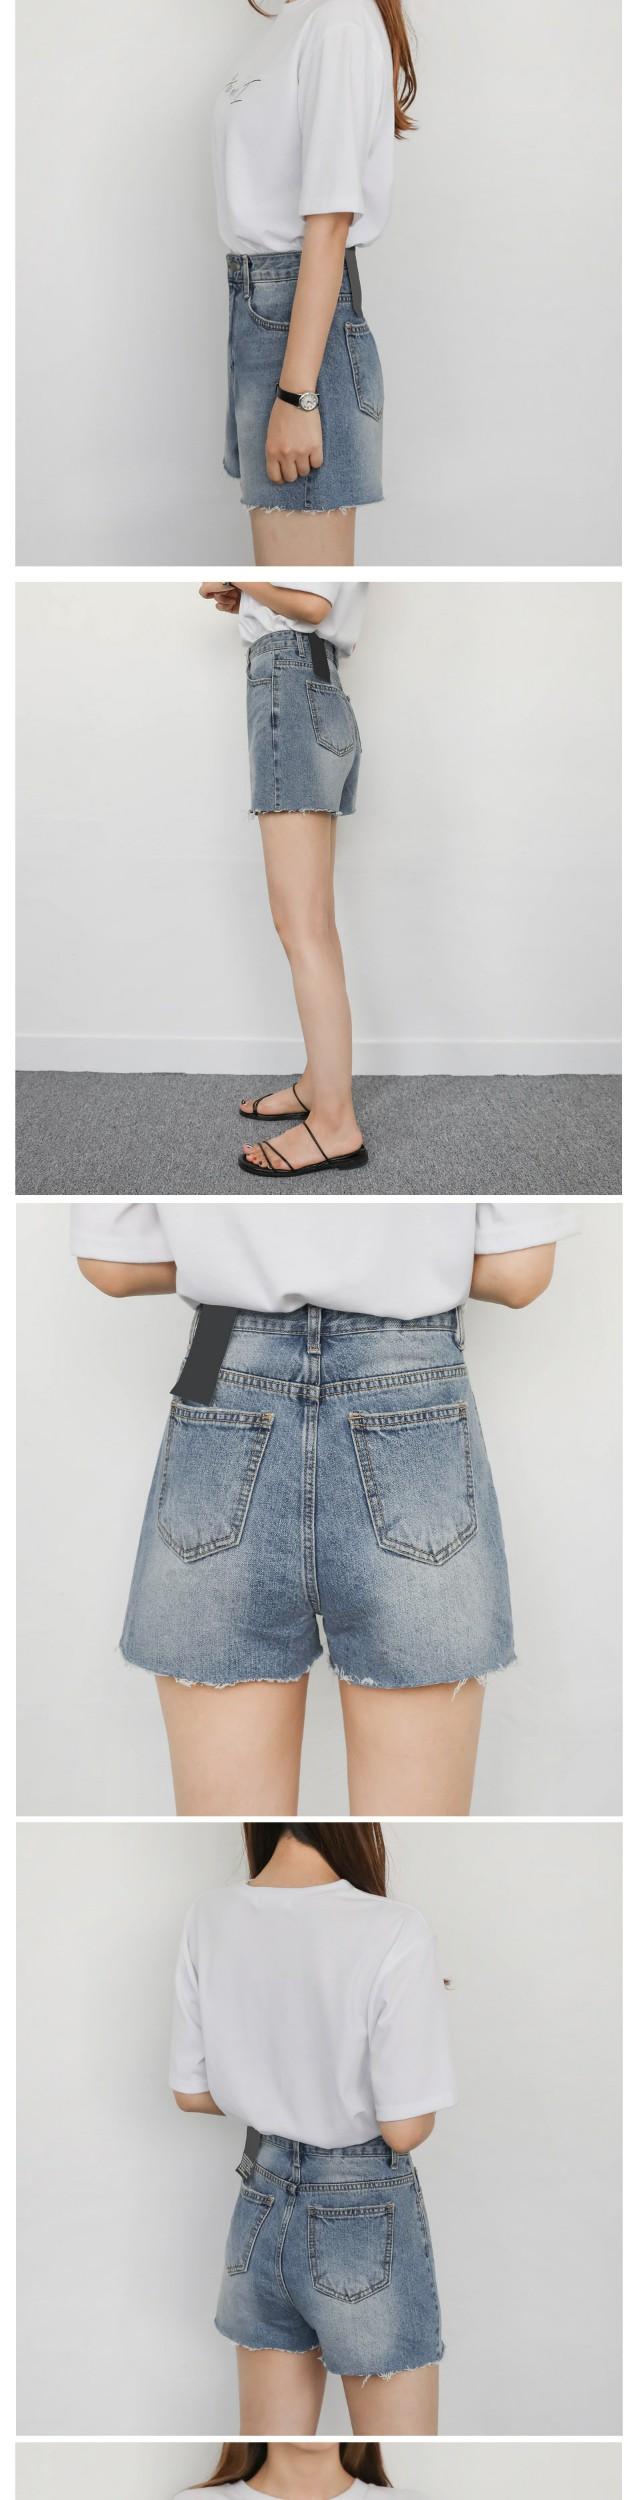 Cradle Cutting Pants